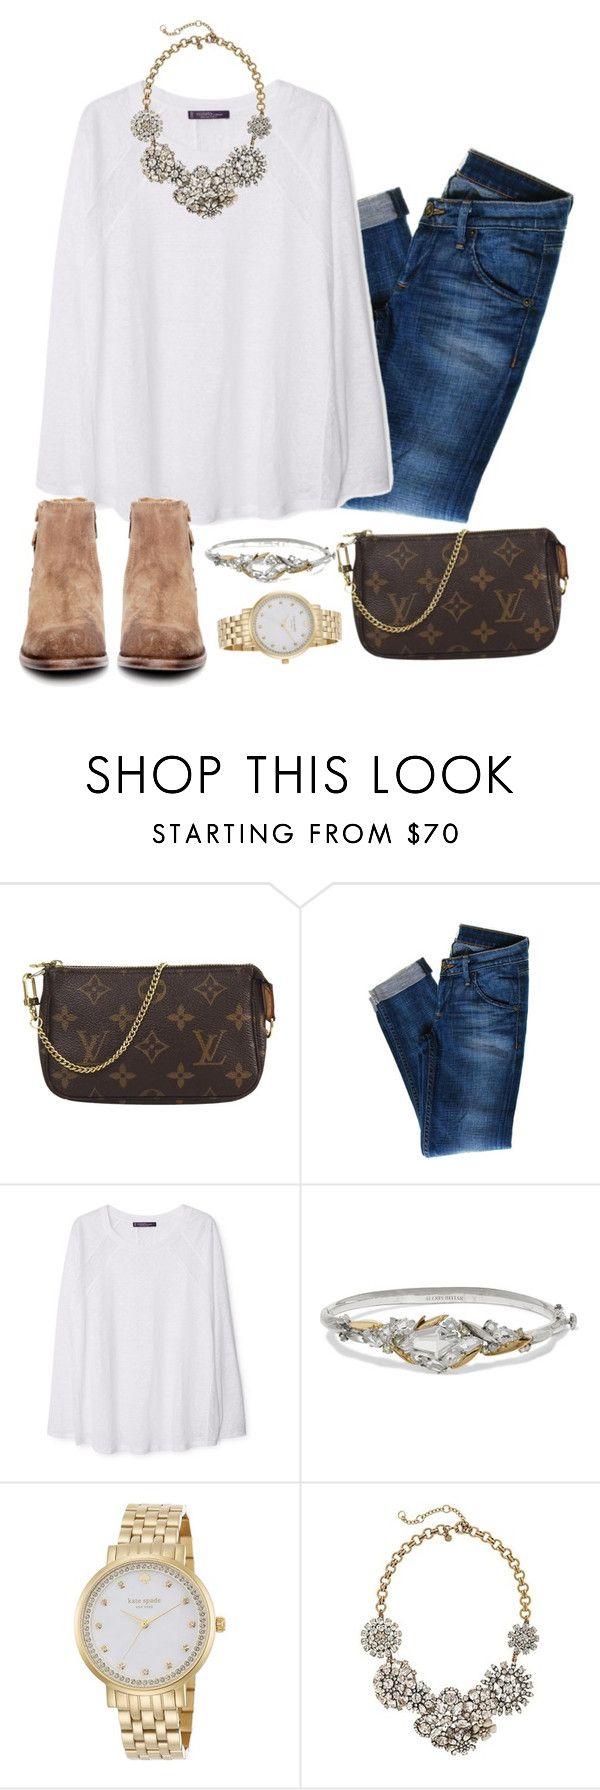 best images about extreme shopaholic on pinterest shopping